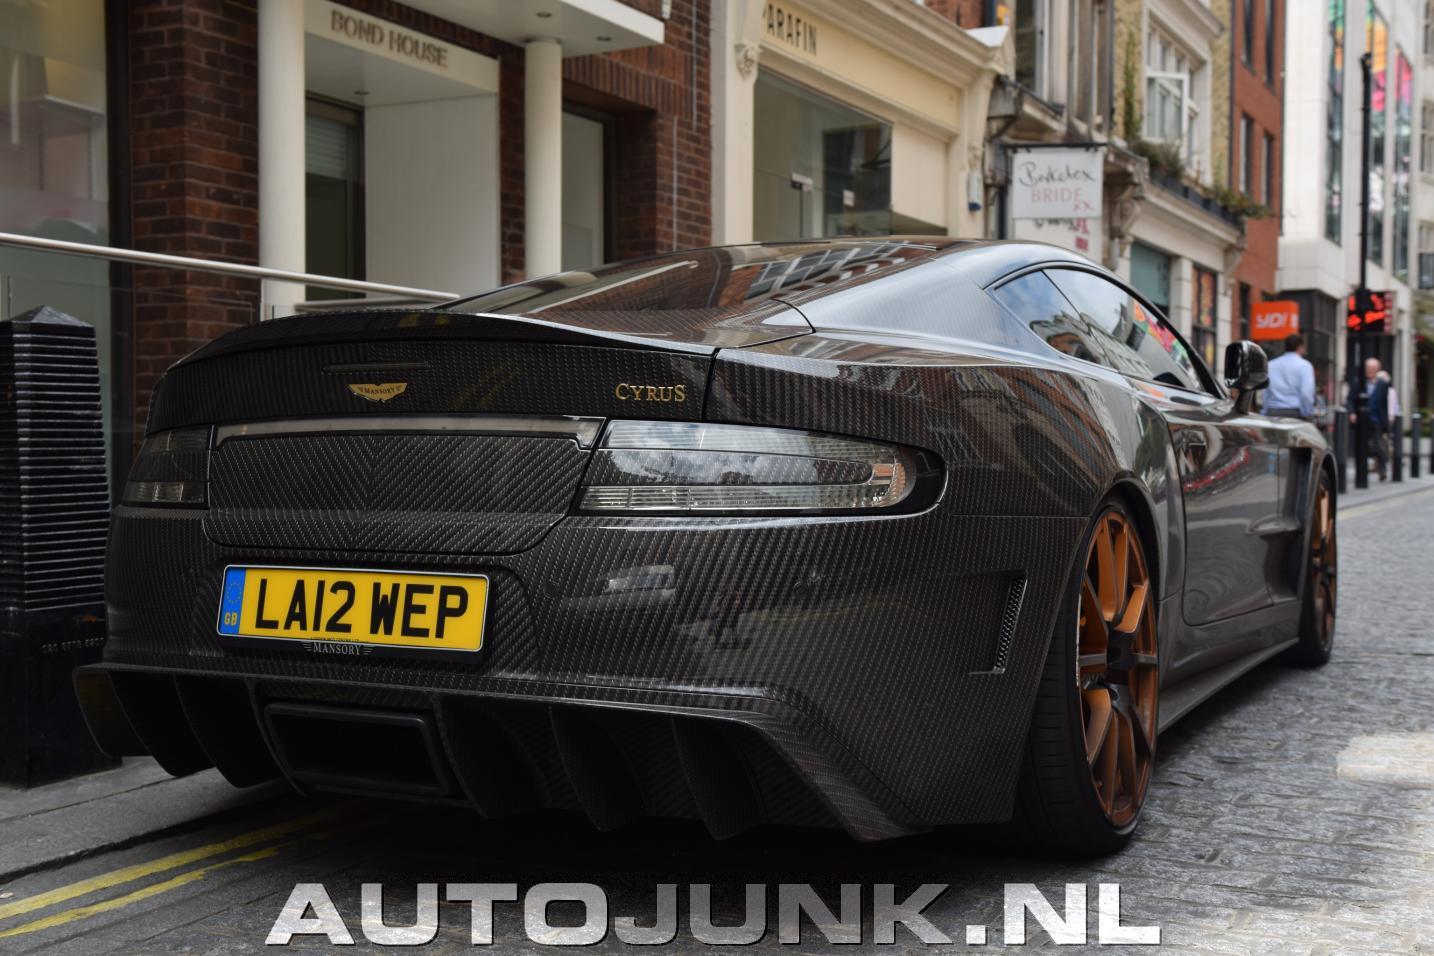 Aston Martin Dbs Cyrus By Mansory Fotos Autojunknl 201508